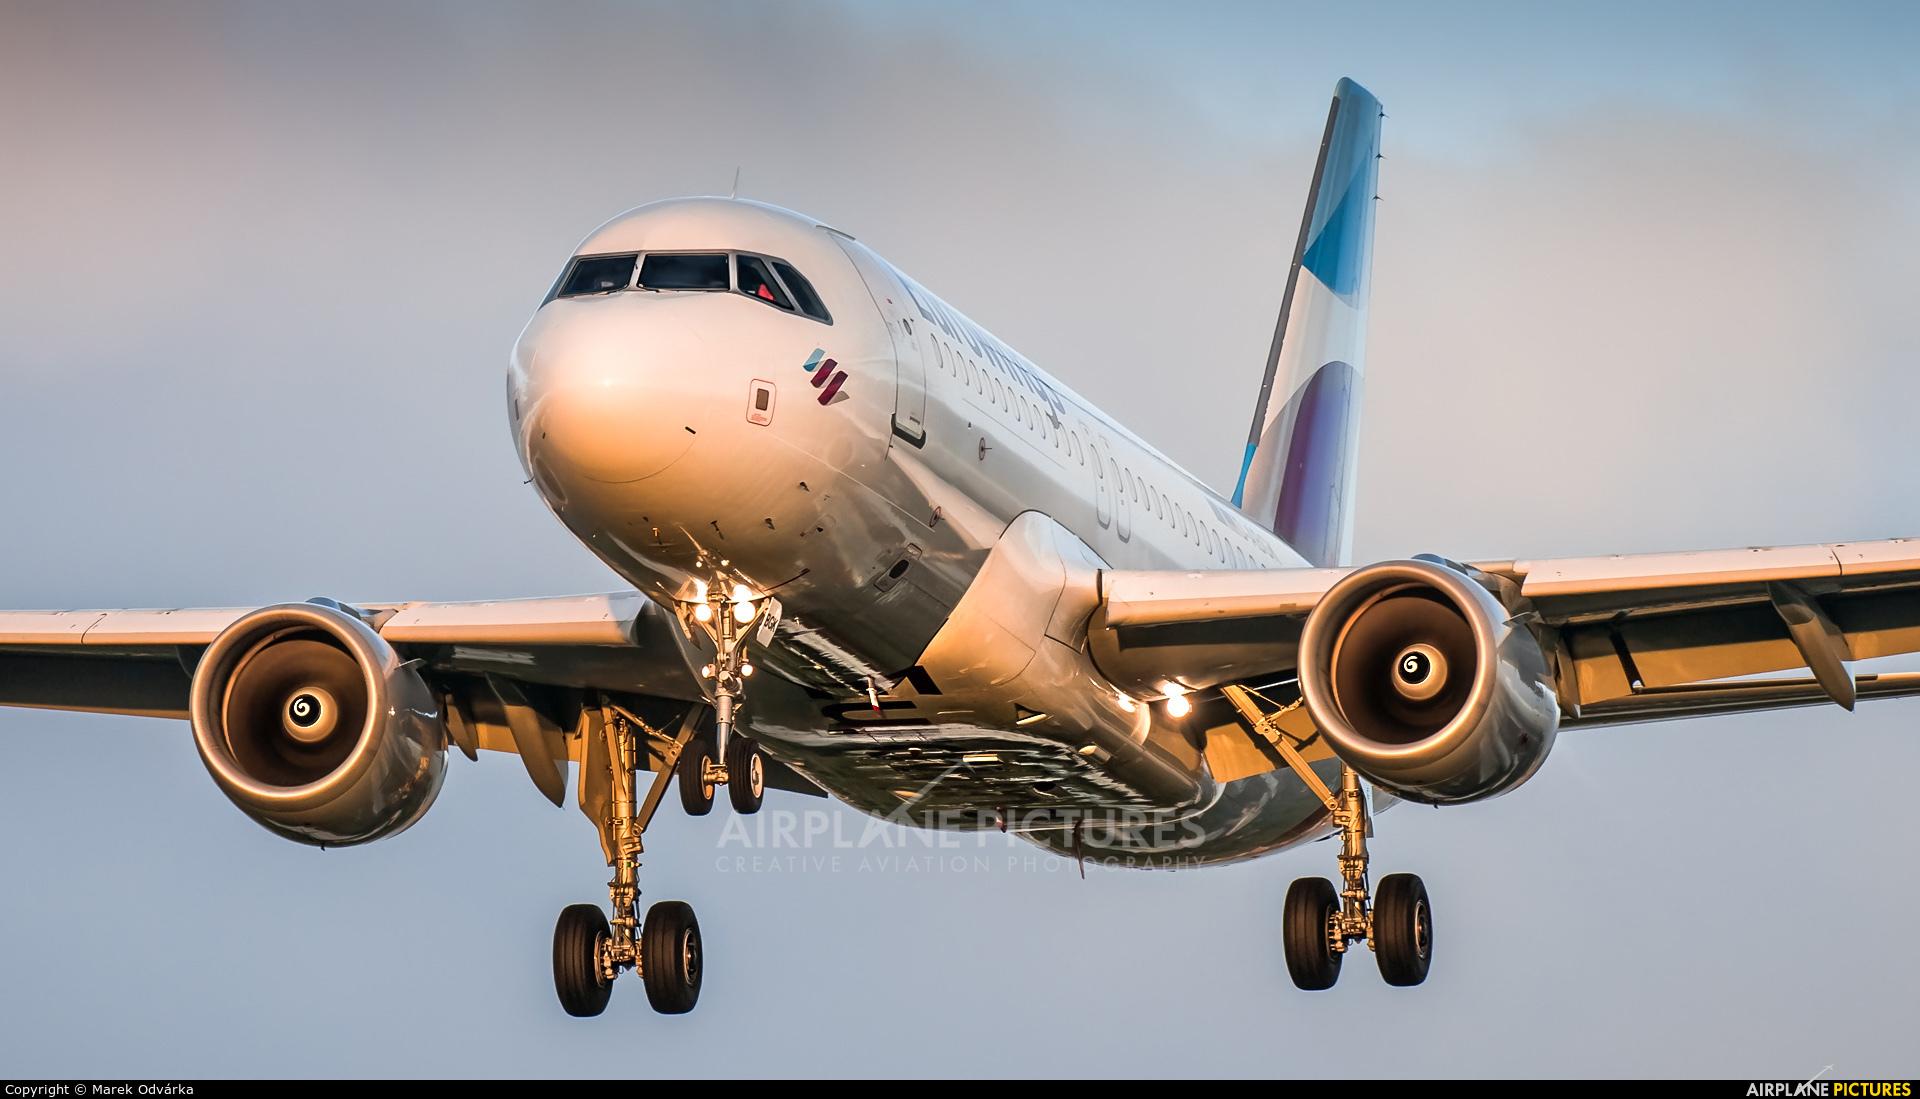 Eurowings D-ABGK aircraft at London - Heathrow